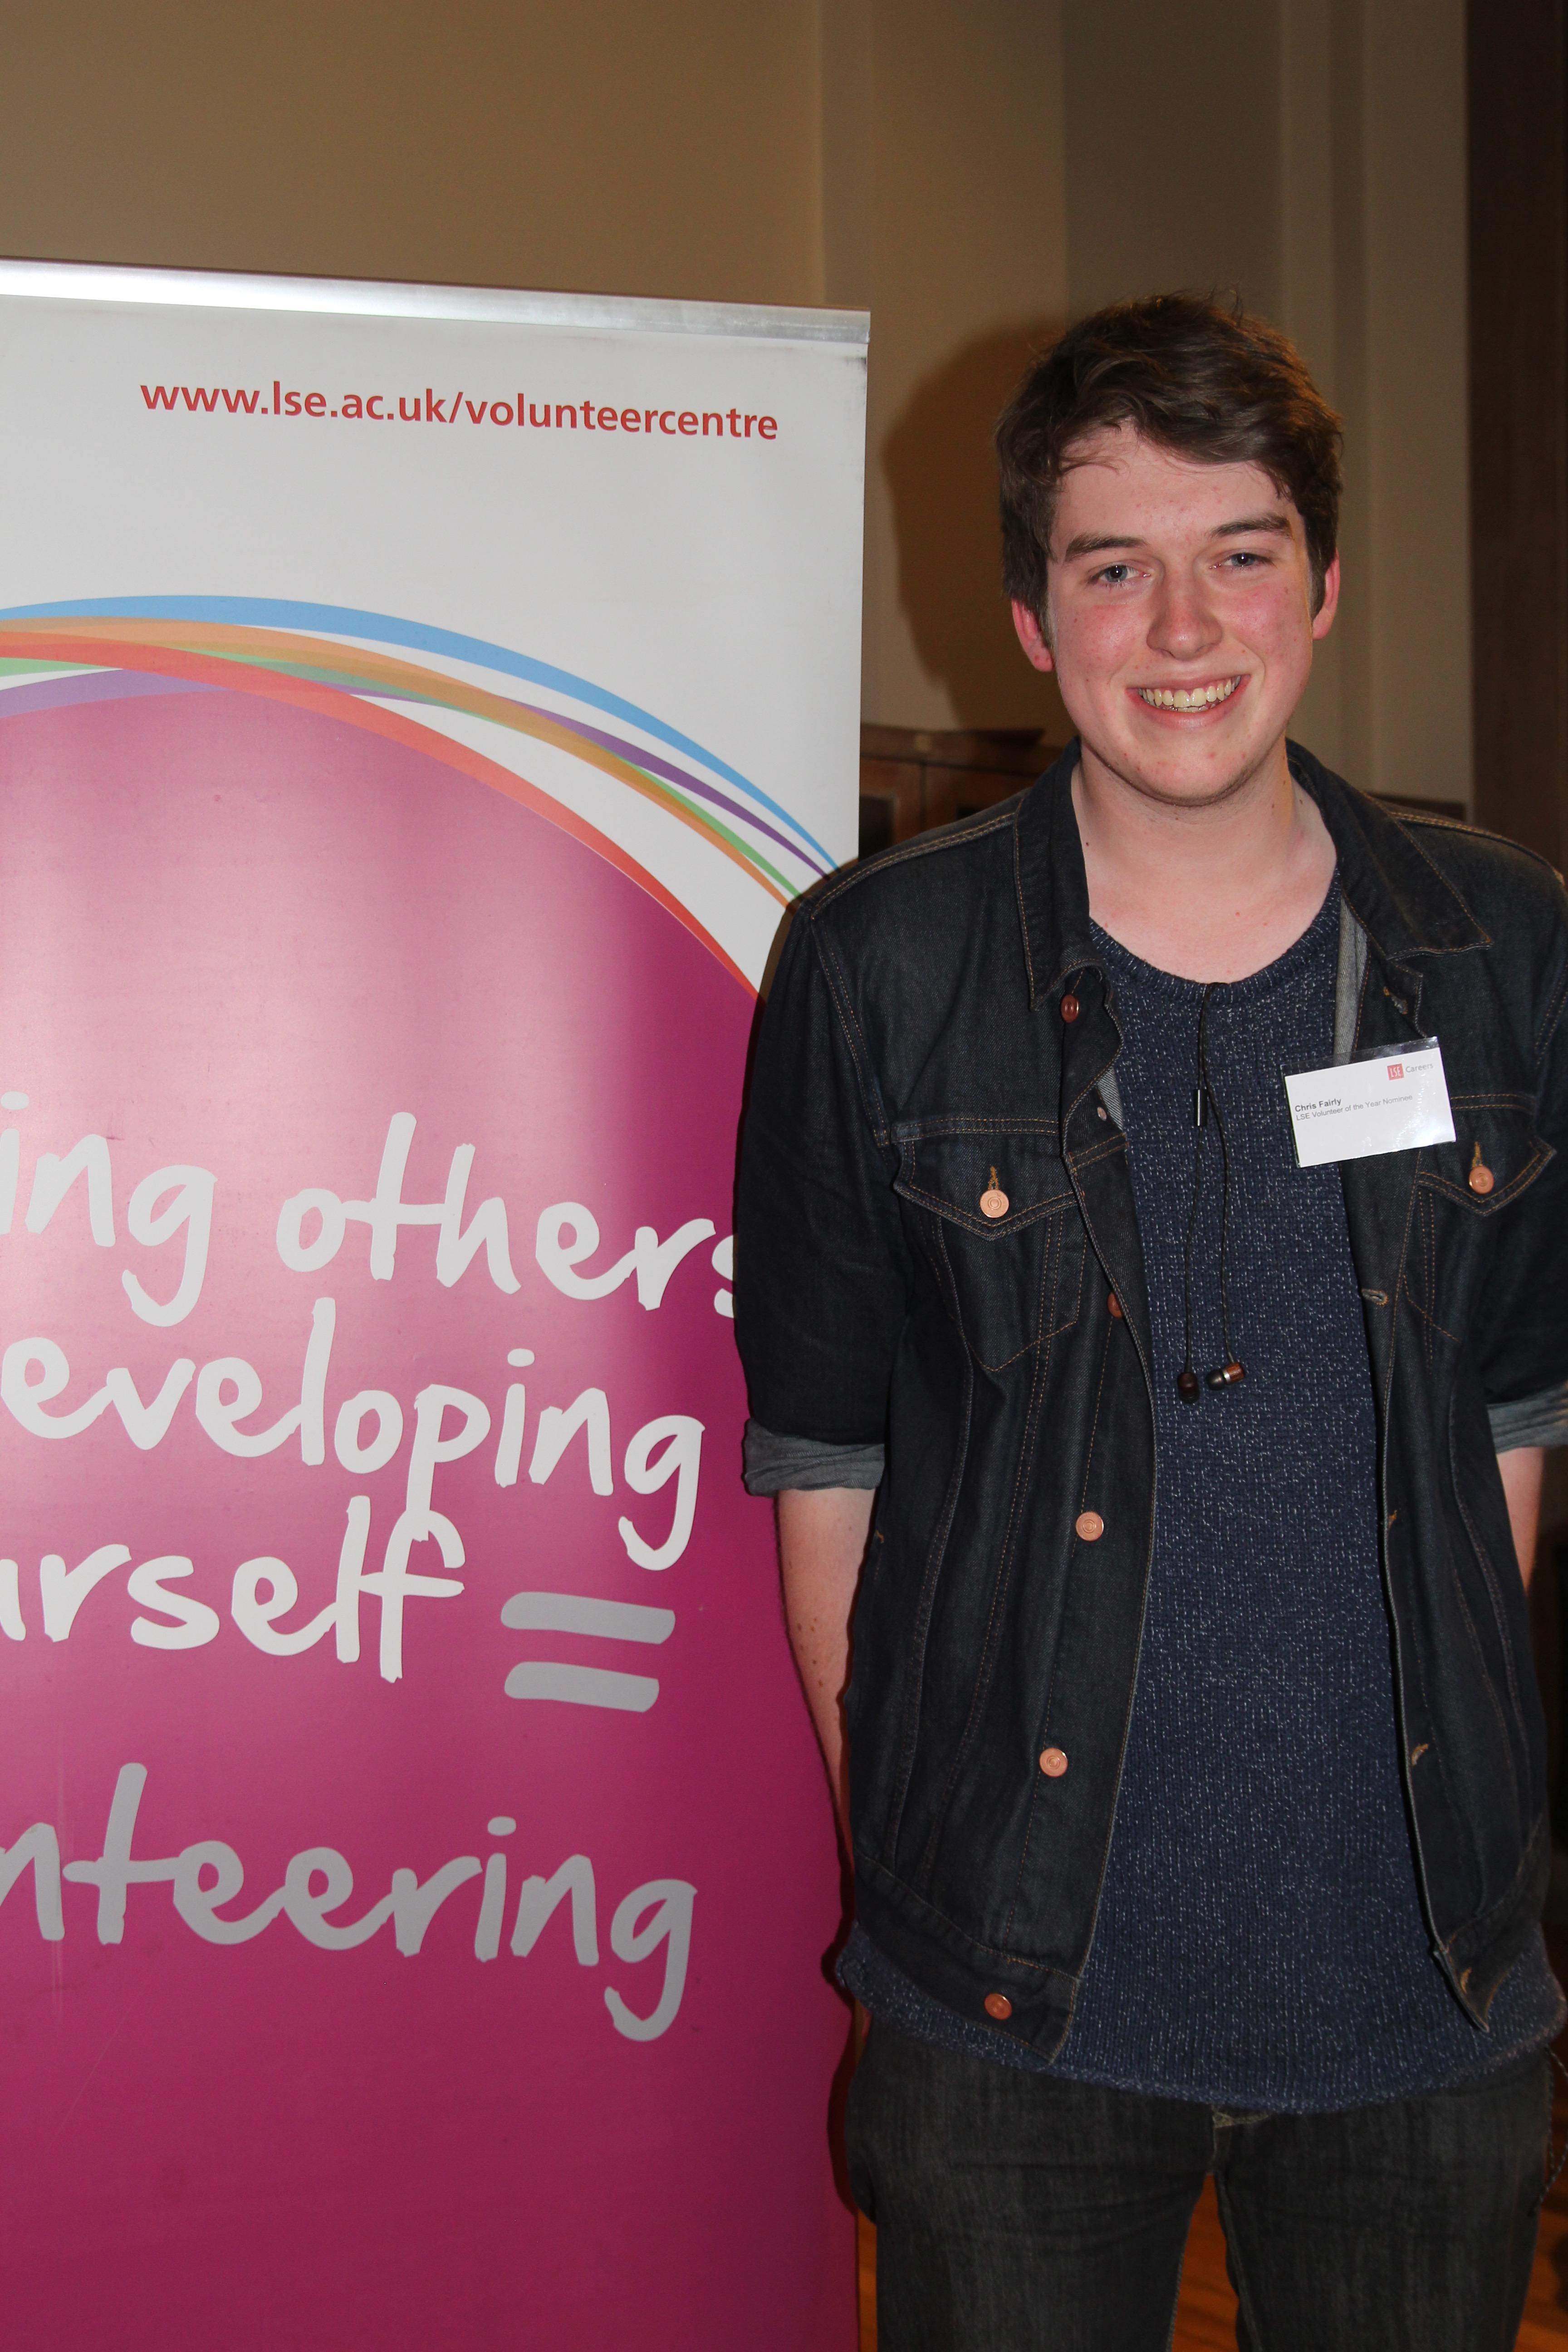 LSE Volunteer of the Year 2016, Chris Fairley